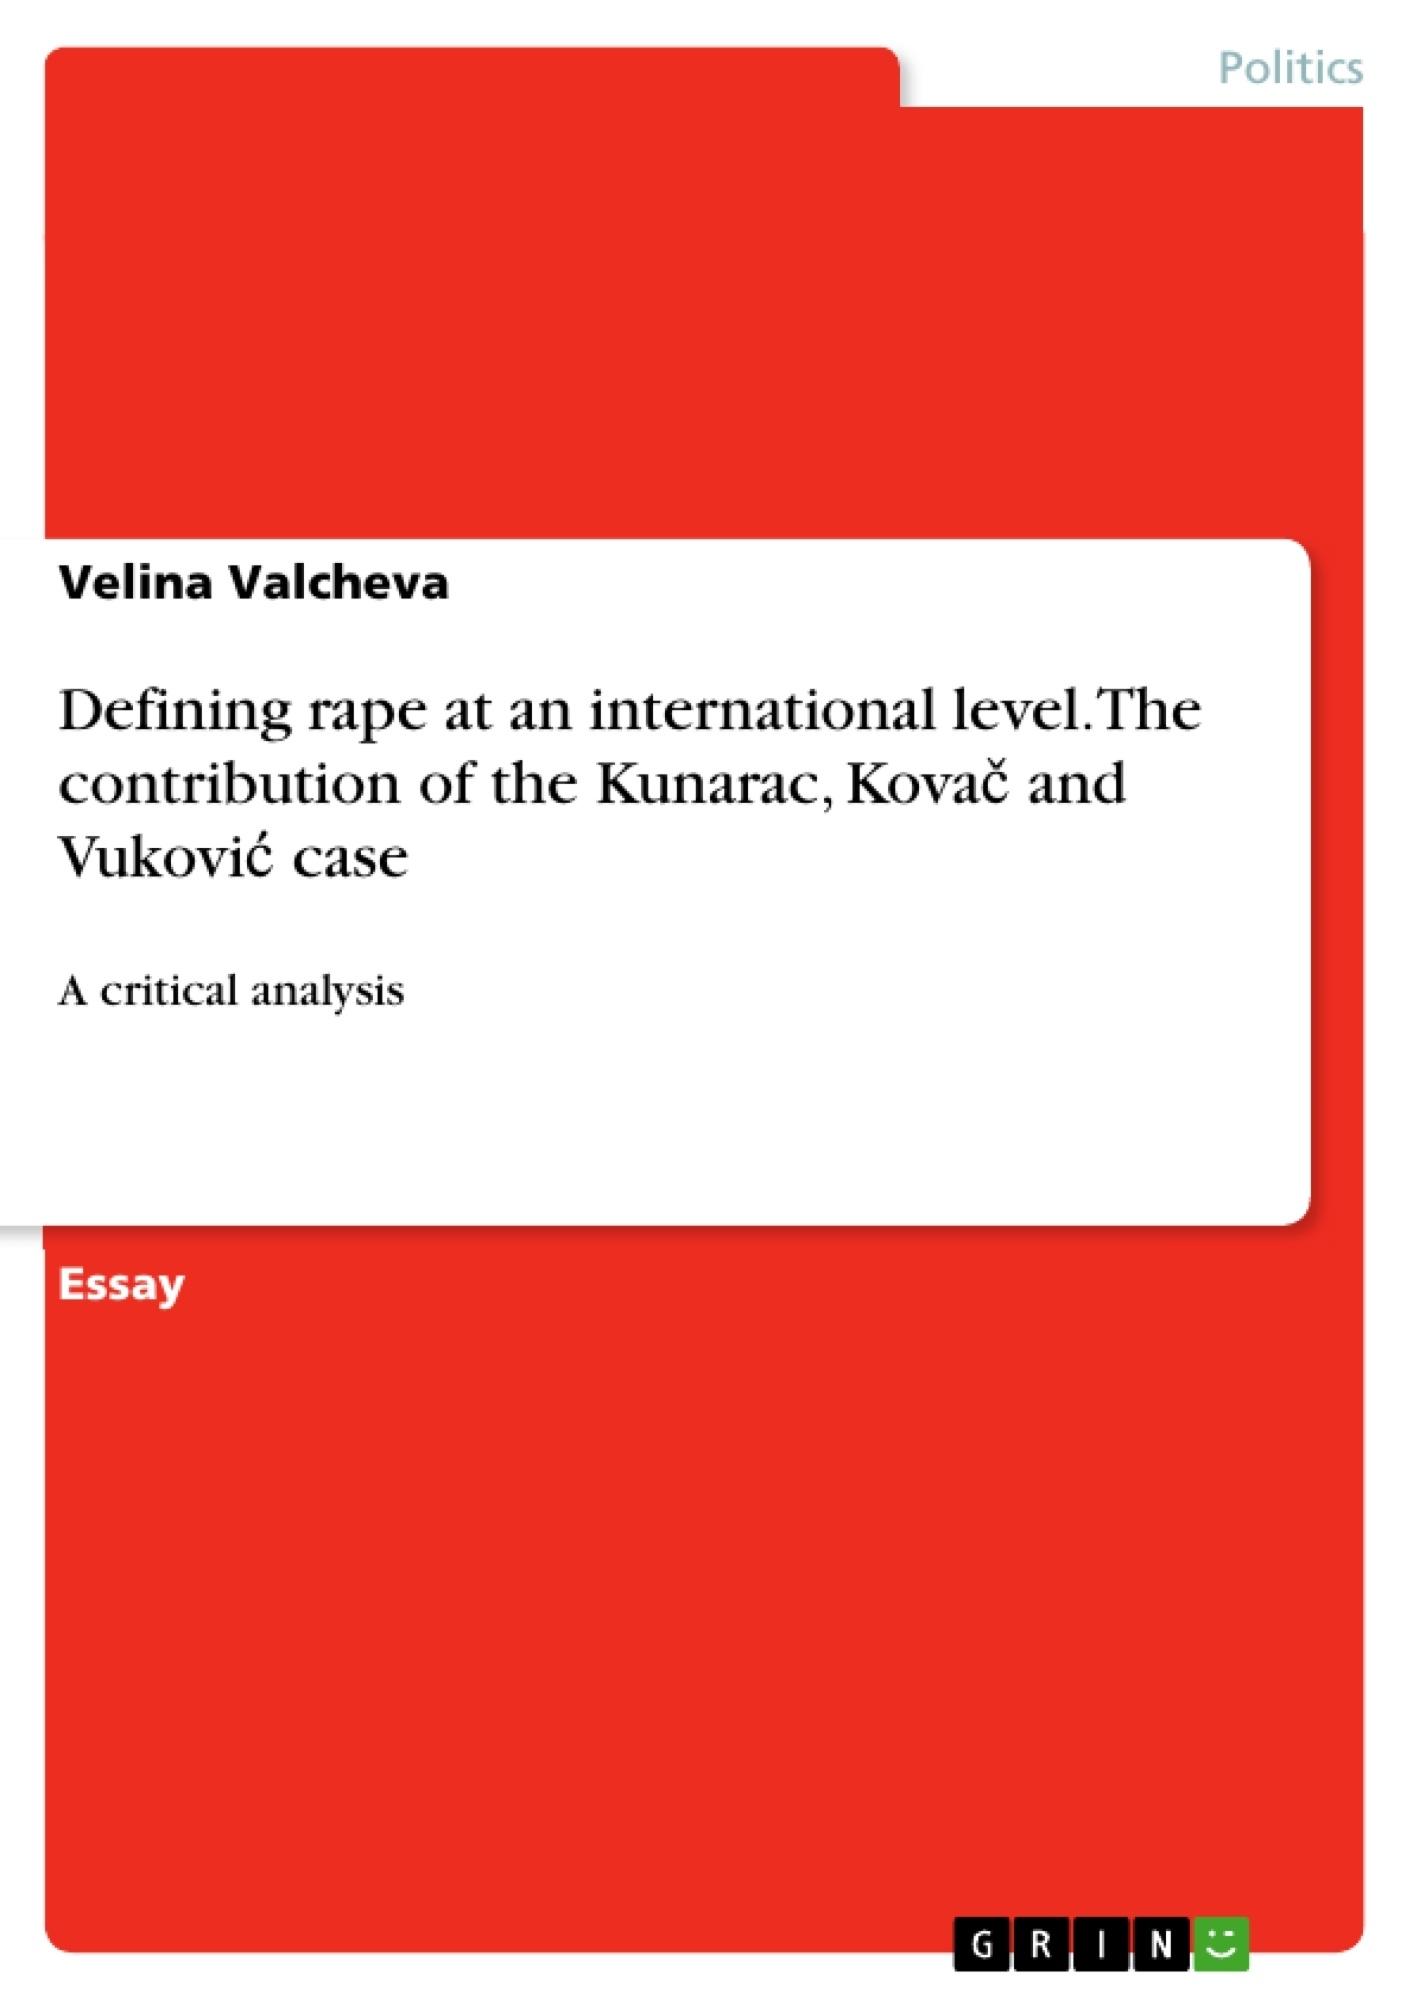 Title: Defining rape at an international level. The contribution of the Kunarac, Kovač and Vuković case